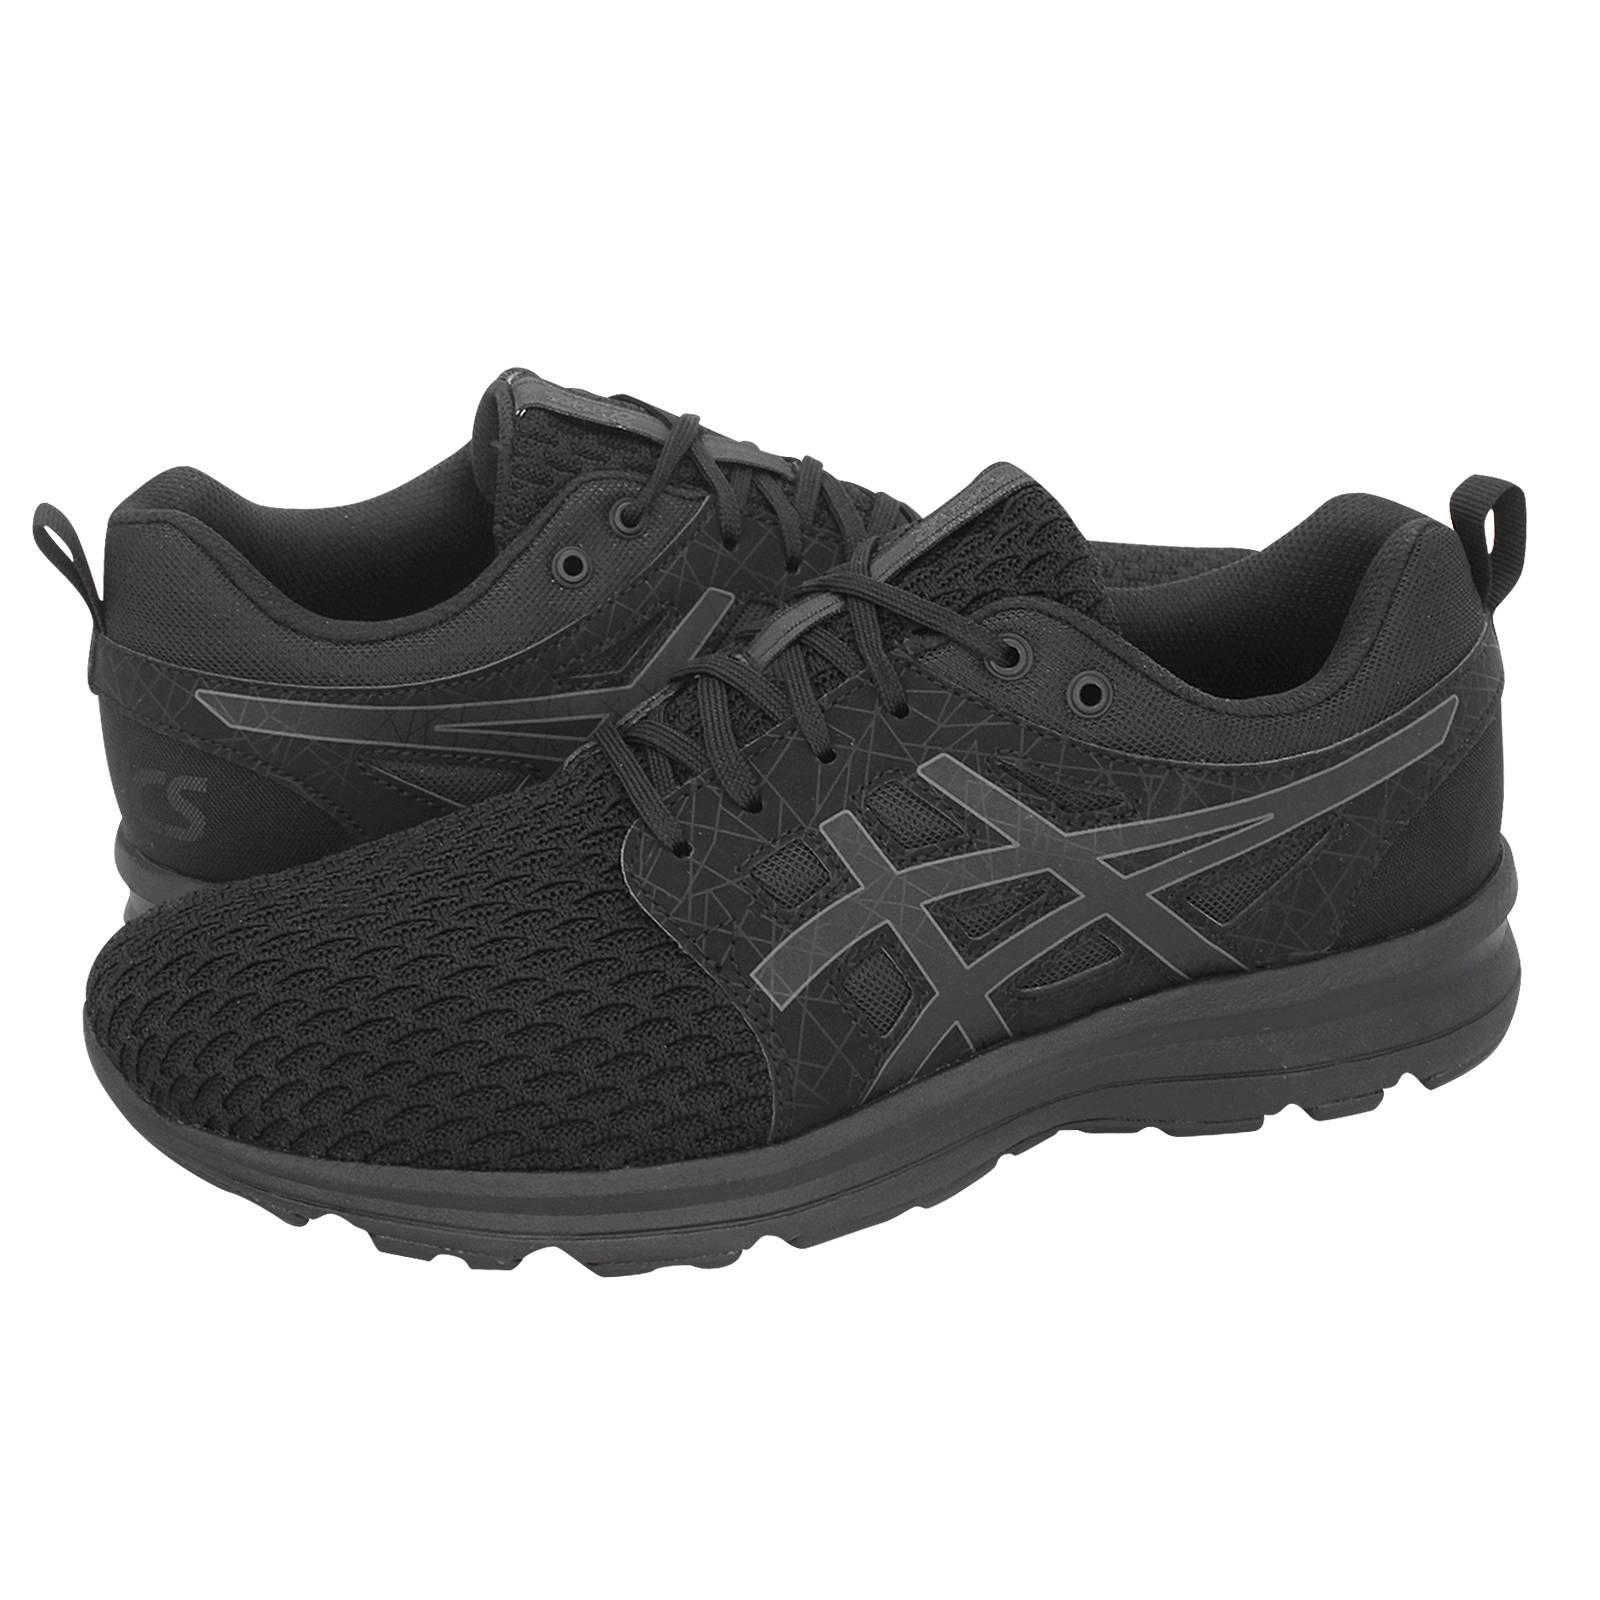 Asics Gel Torrance athletic shoes